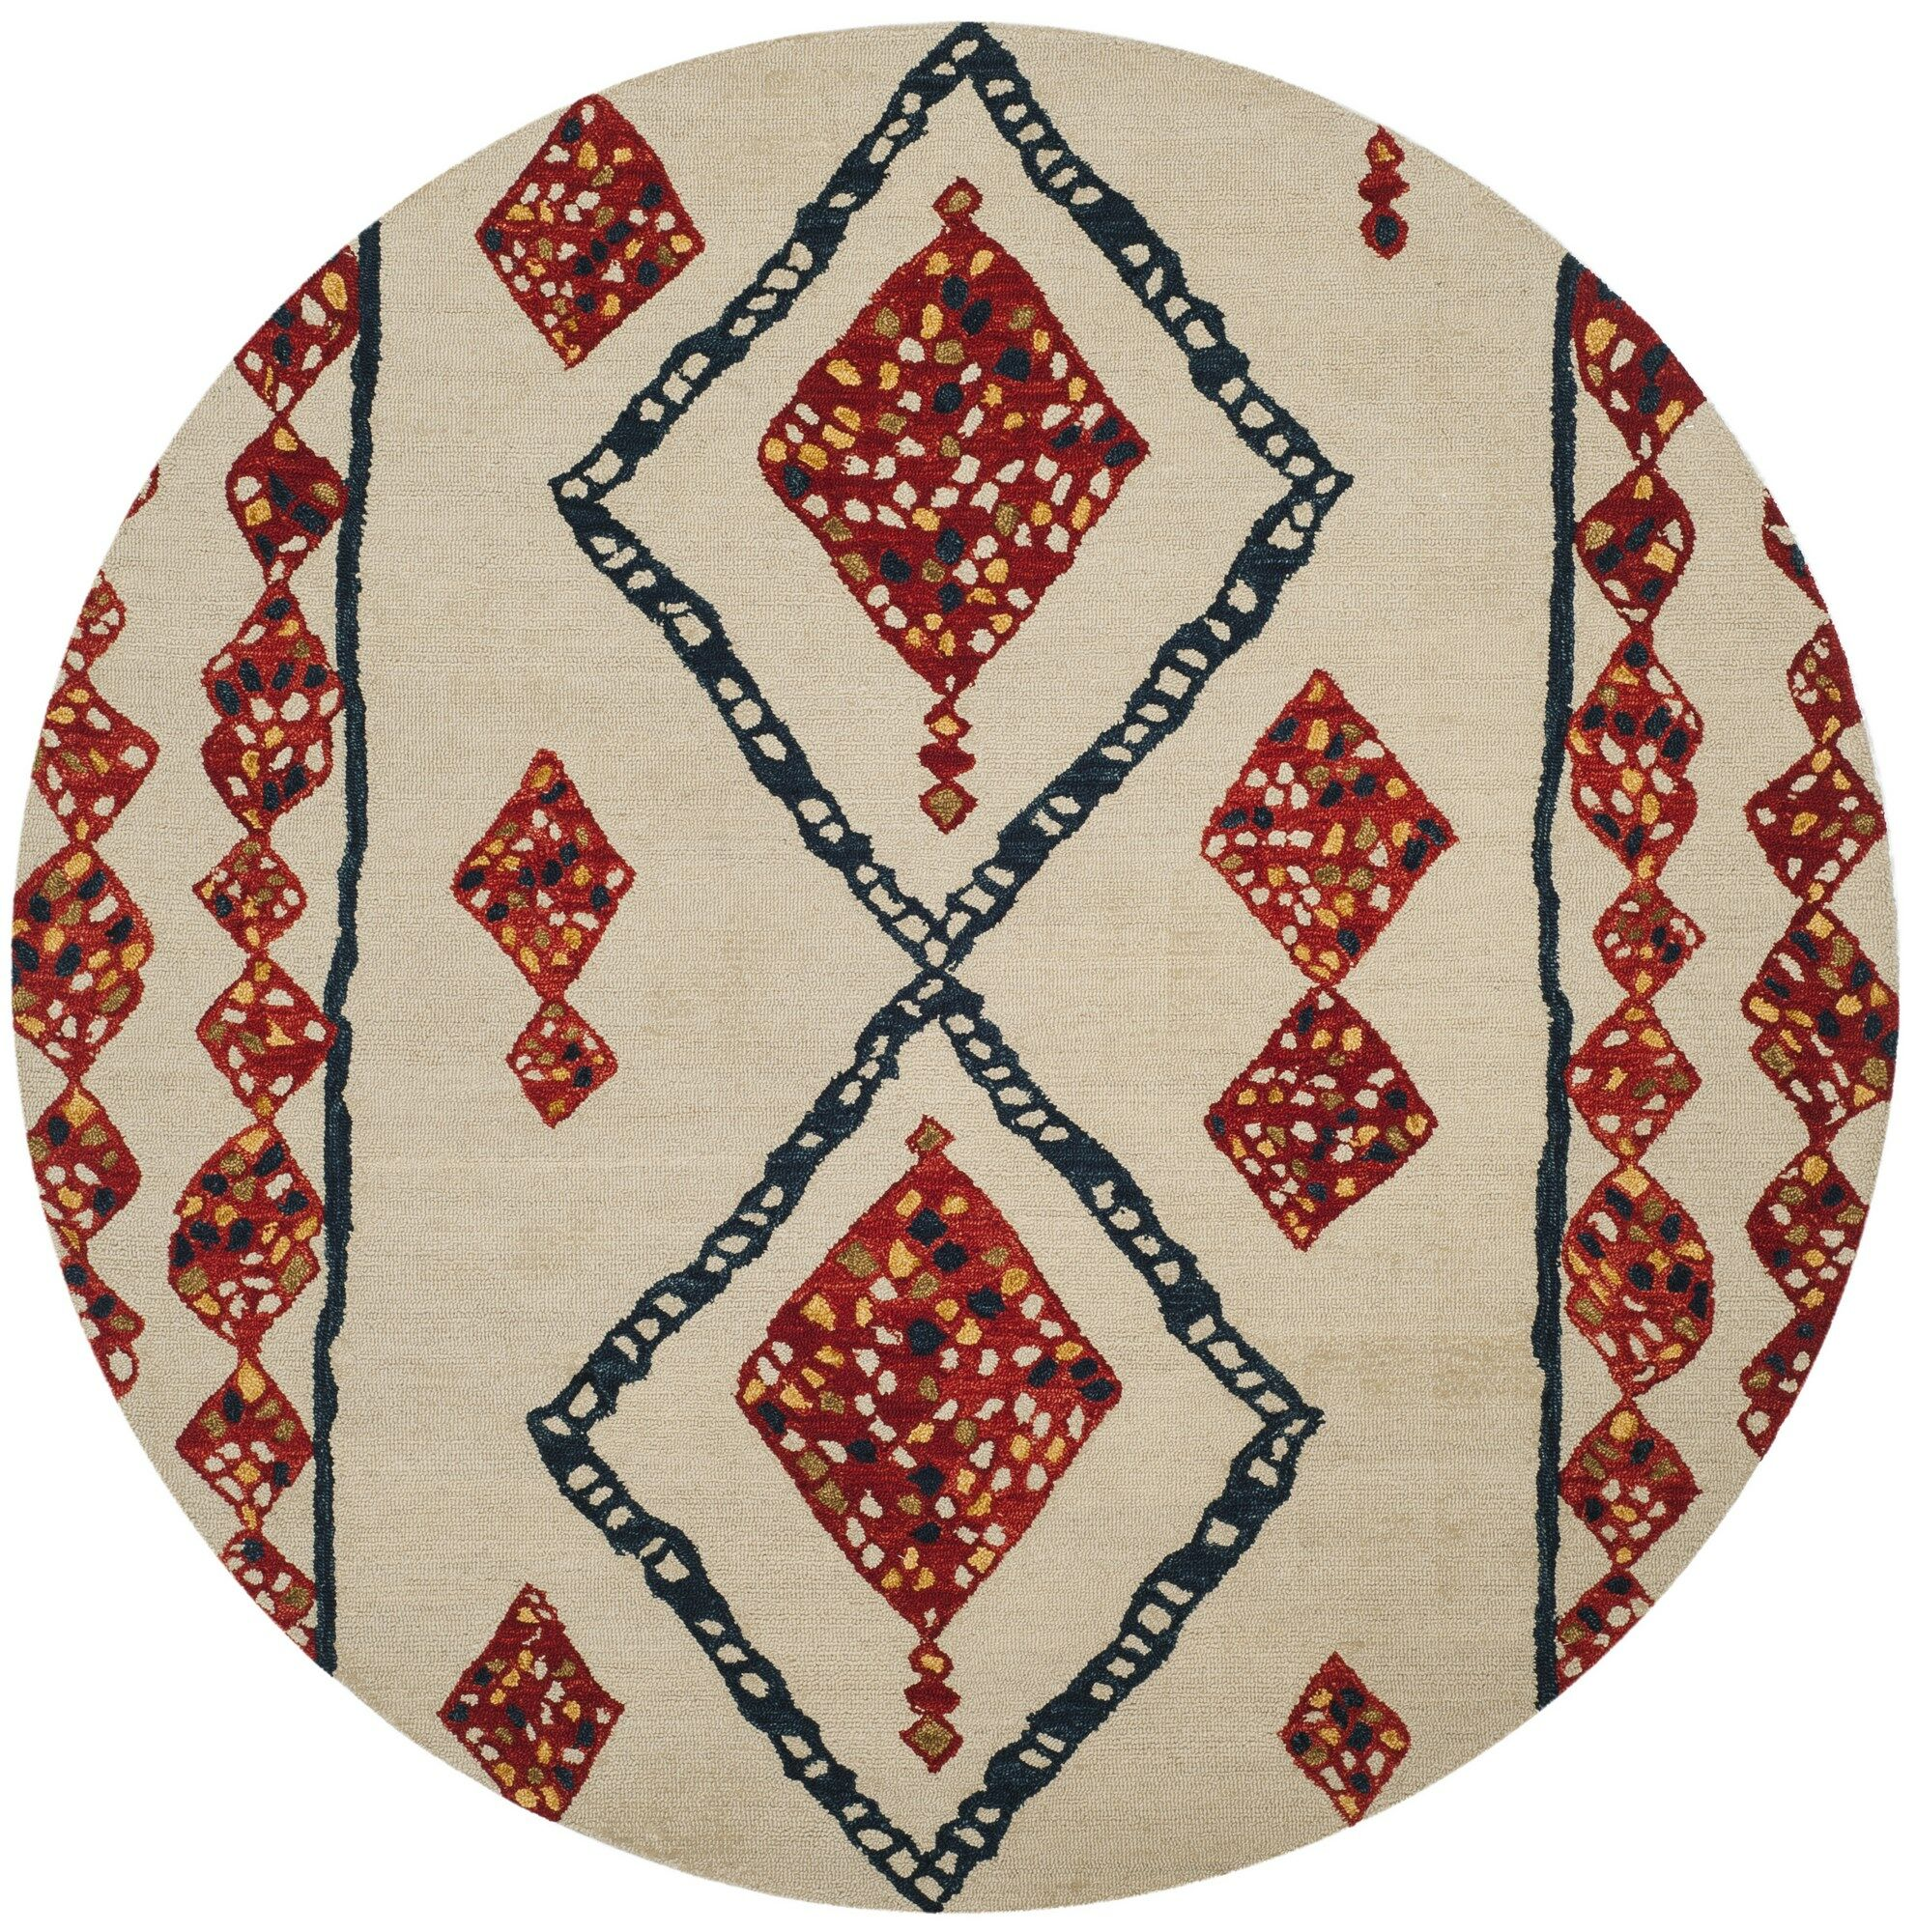 Aldwich Hand-Tufted Beige/Red Area Rug Rug Size: Round 7'